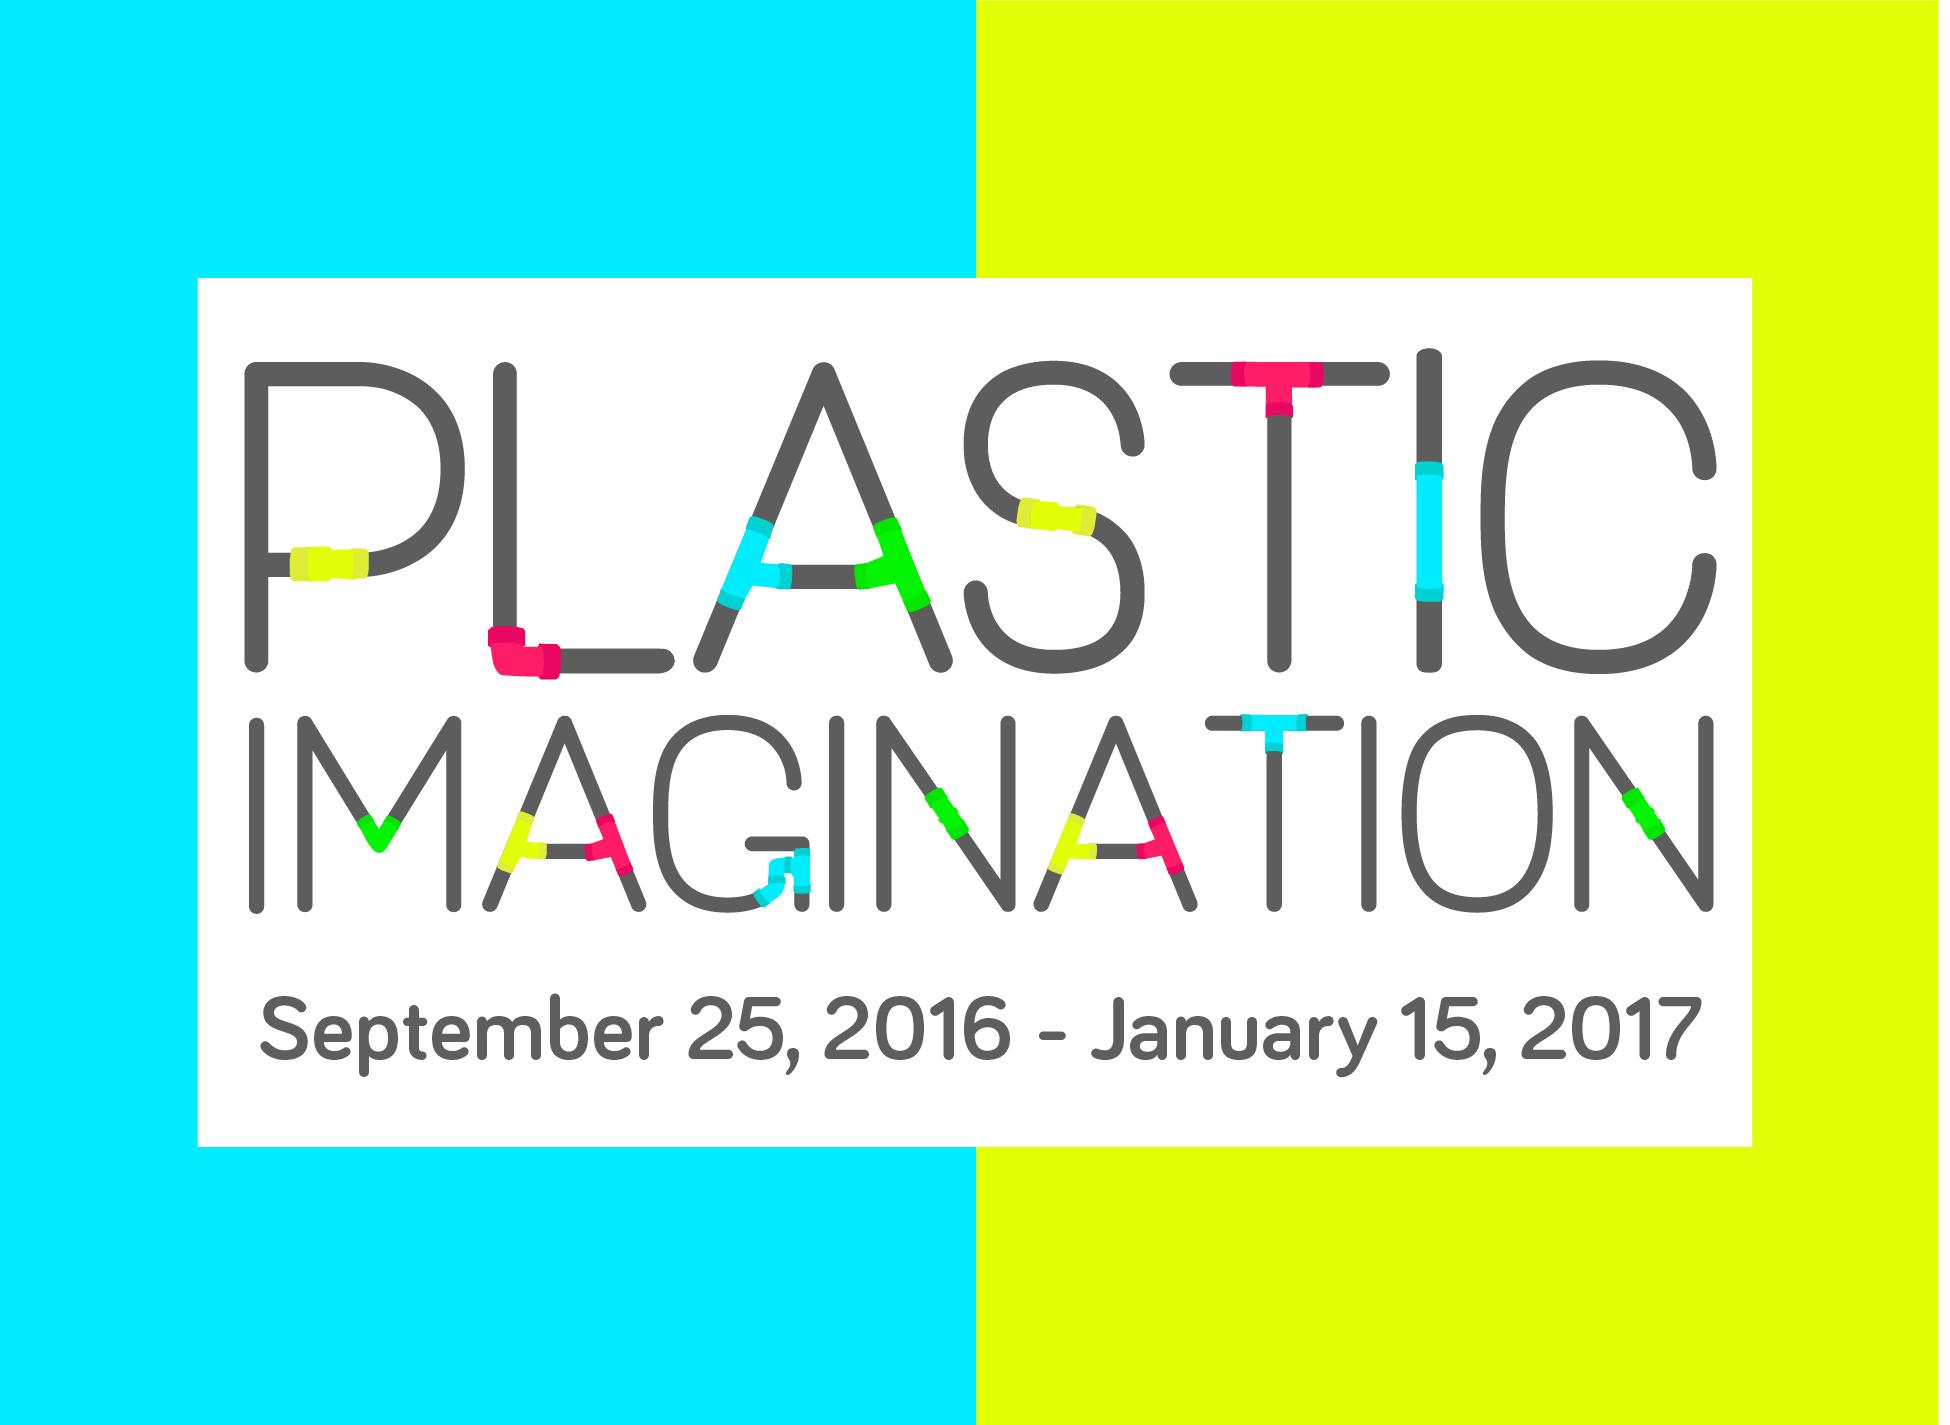 postcard plastic imagination final-01.png